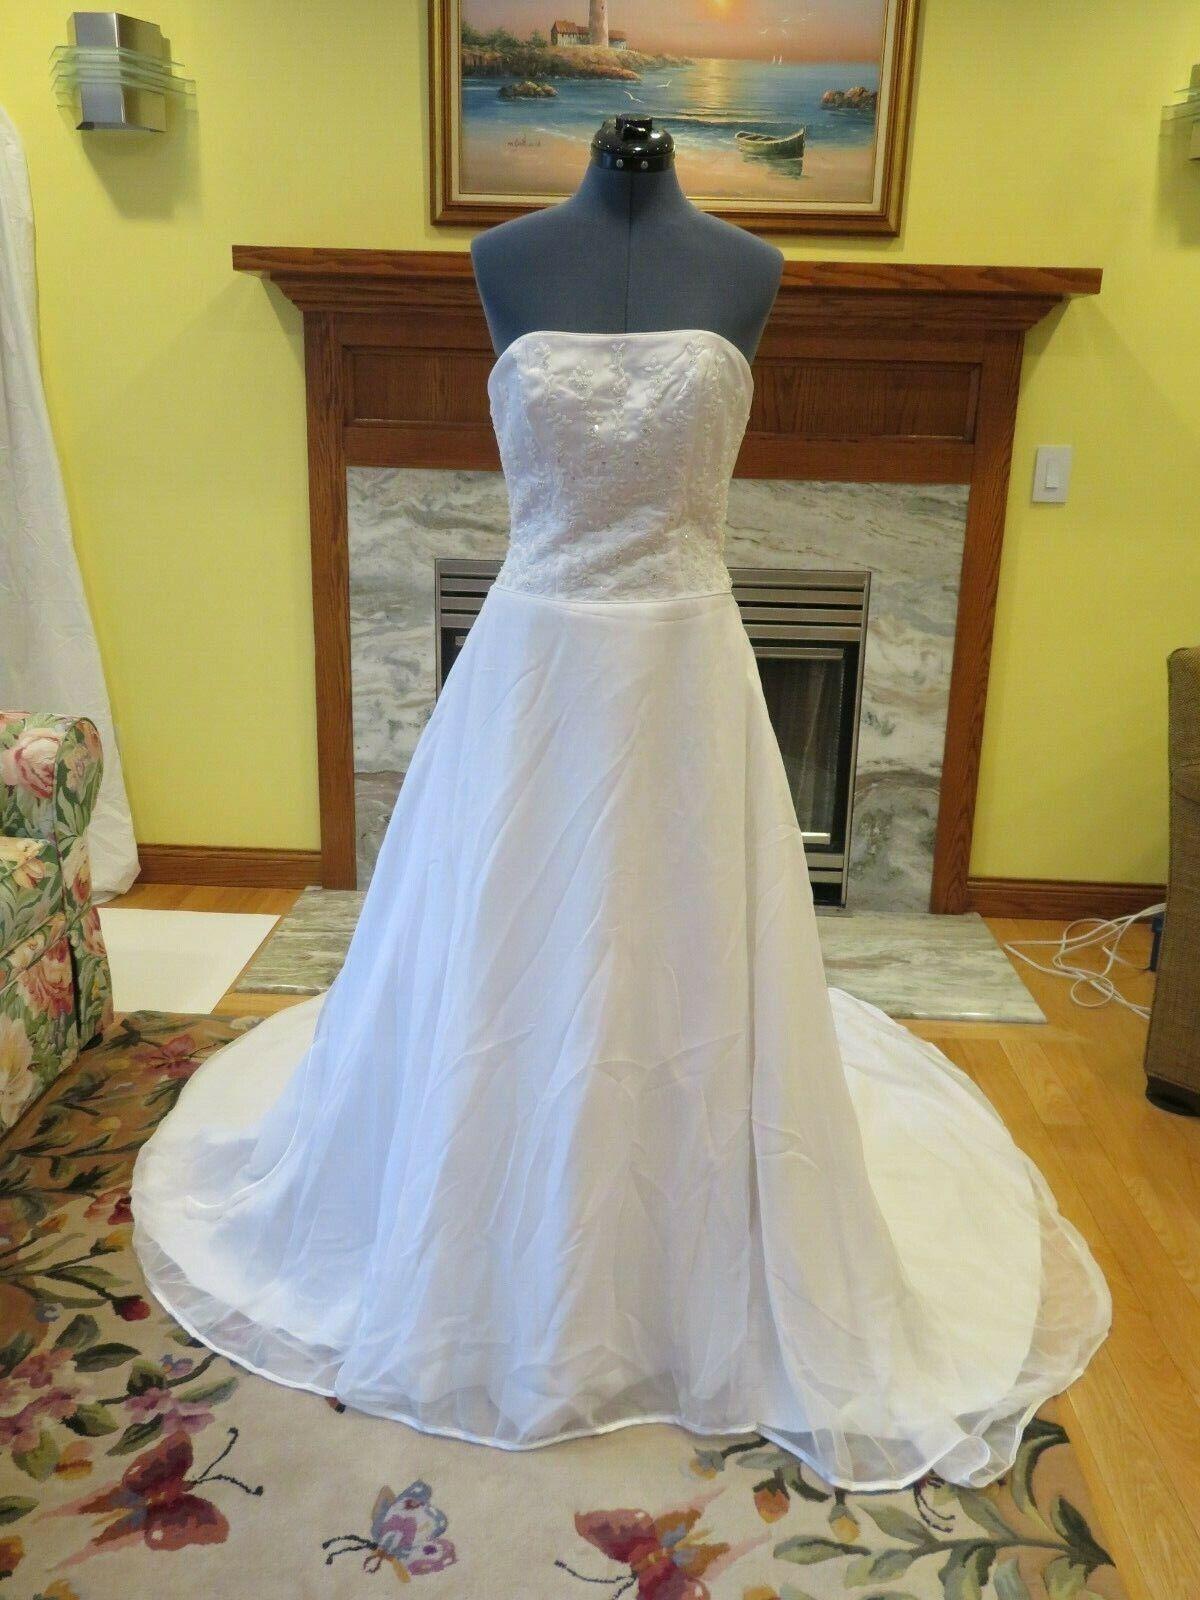 Amy Lee Wedding Dress Flowers Embellished Cinderella Gown Train STUNNING WOW